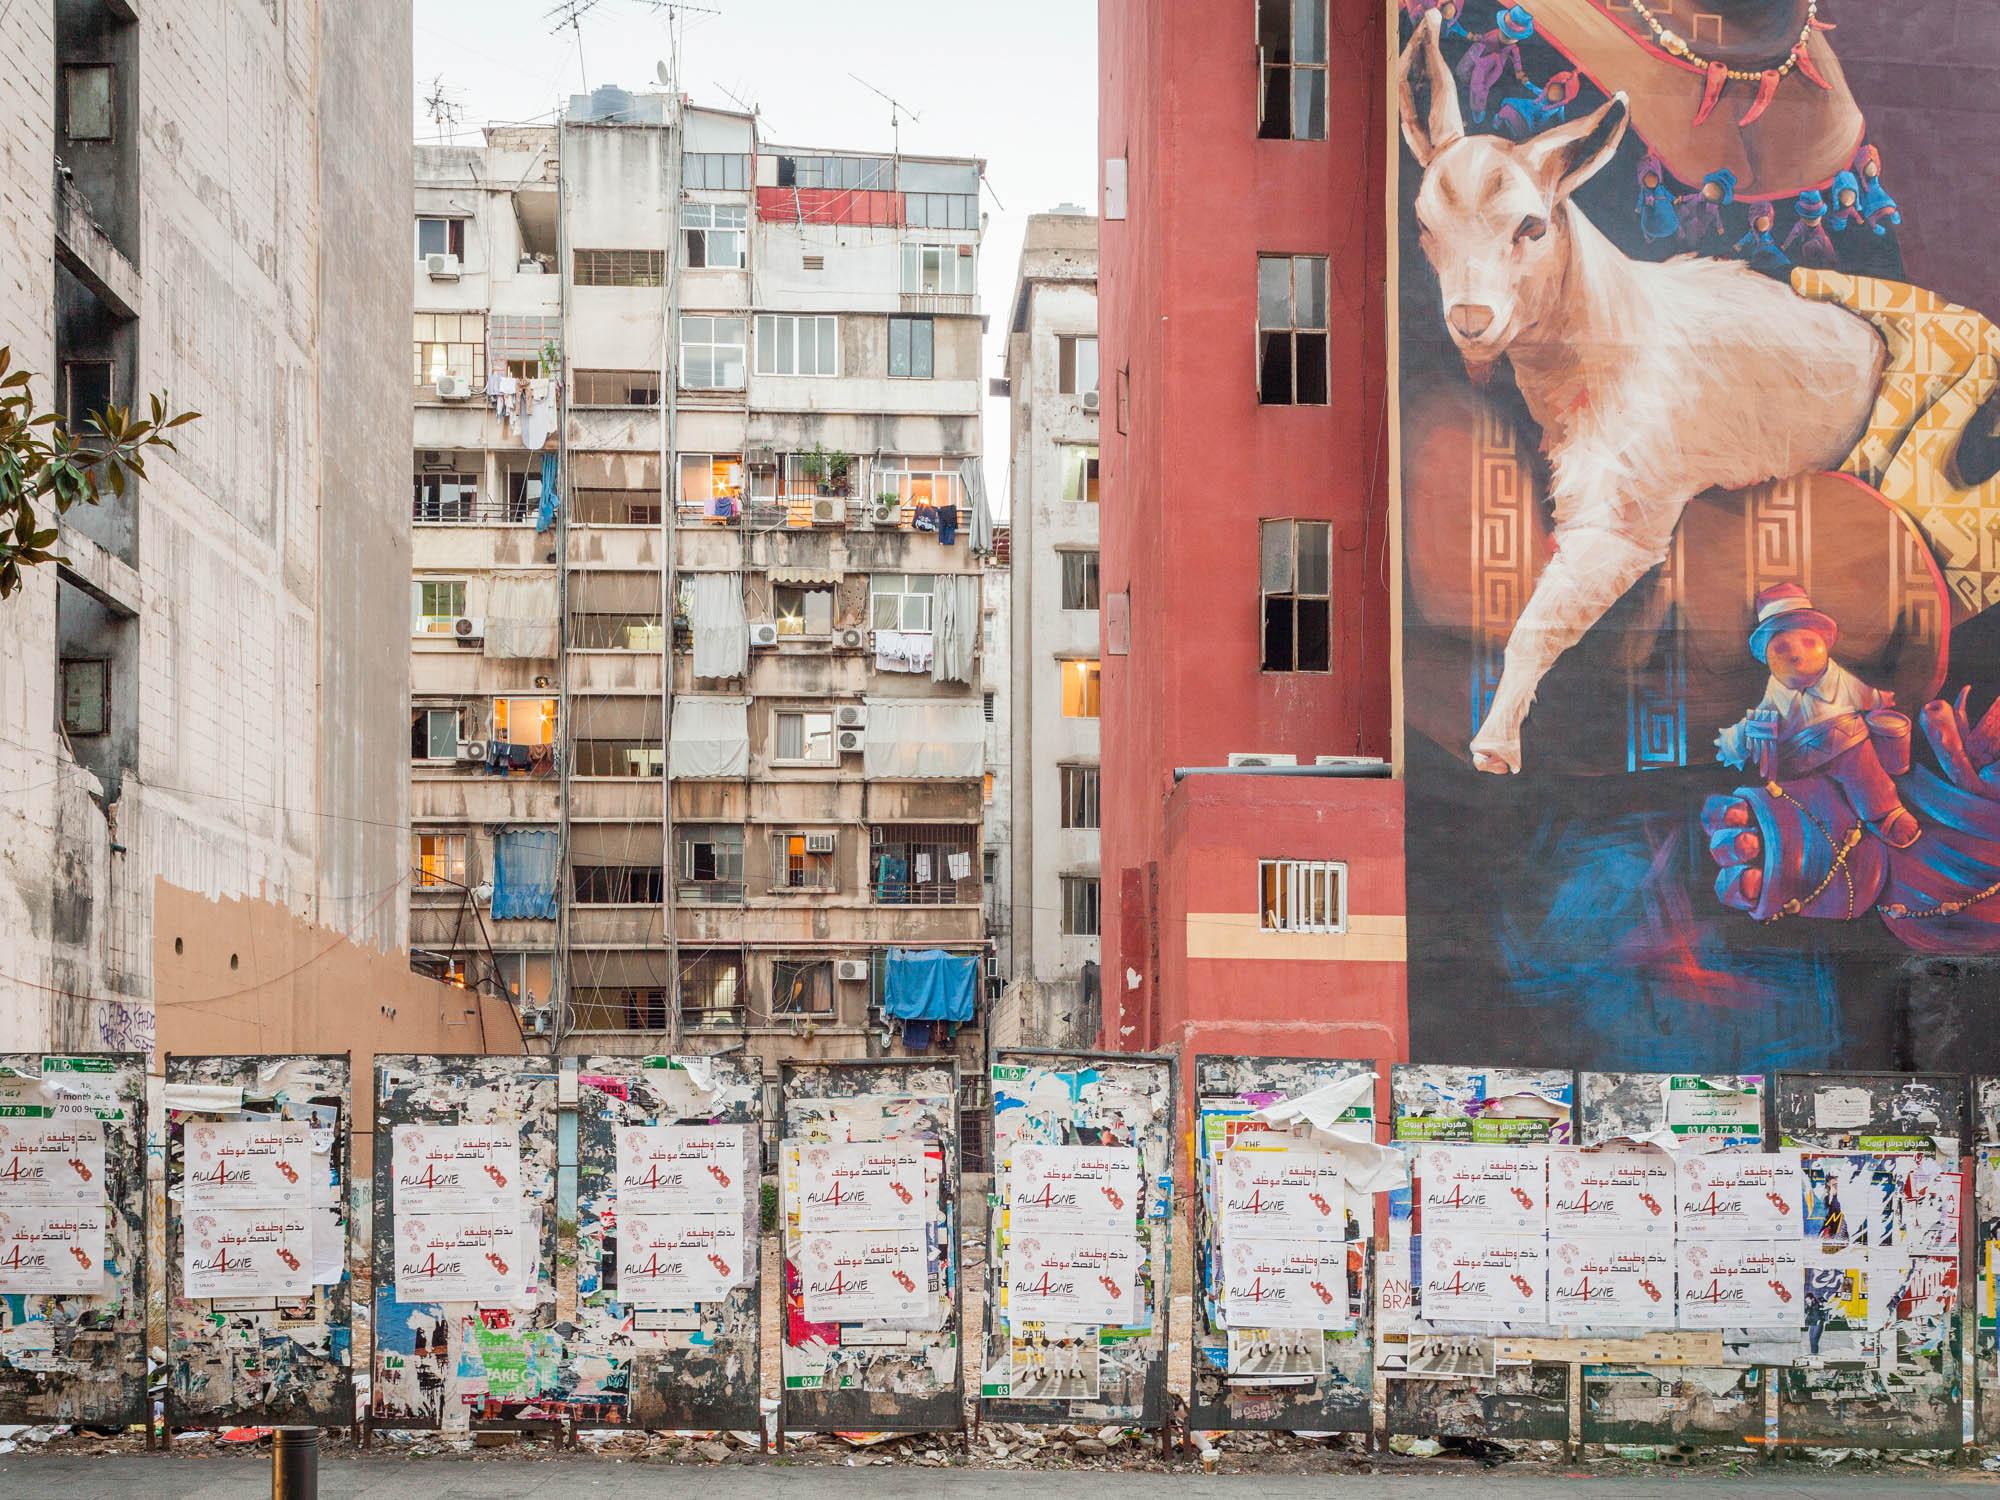 Beirut-9126.jpg